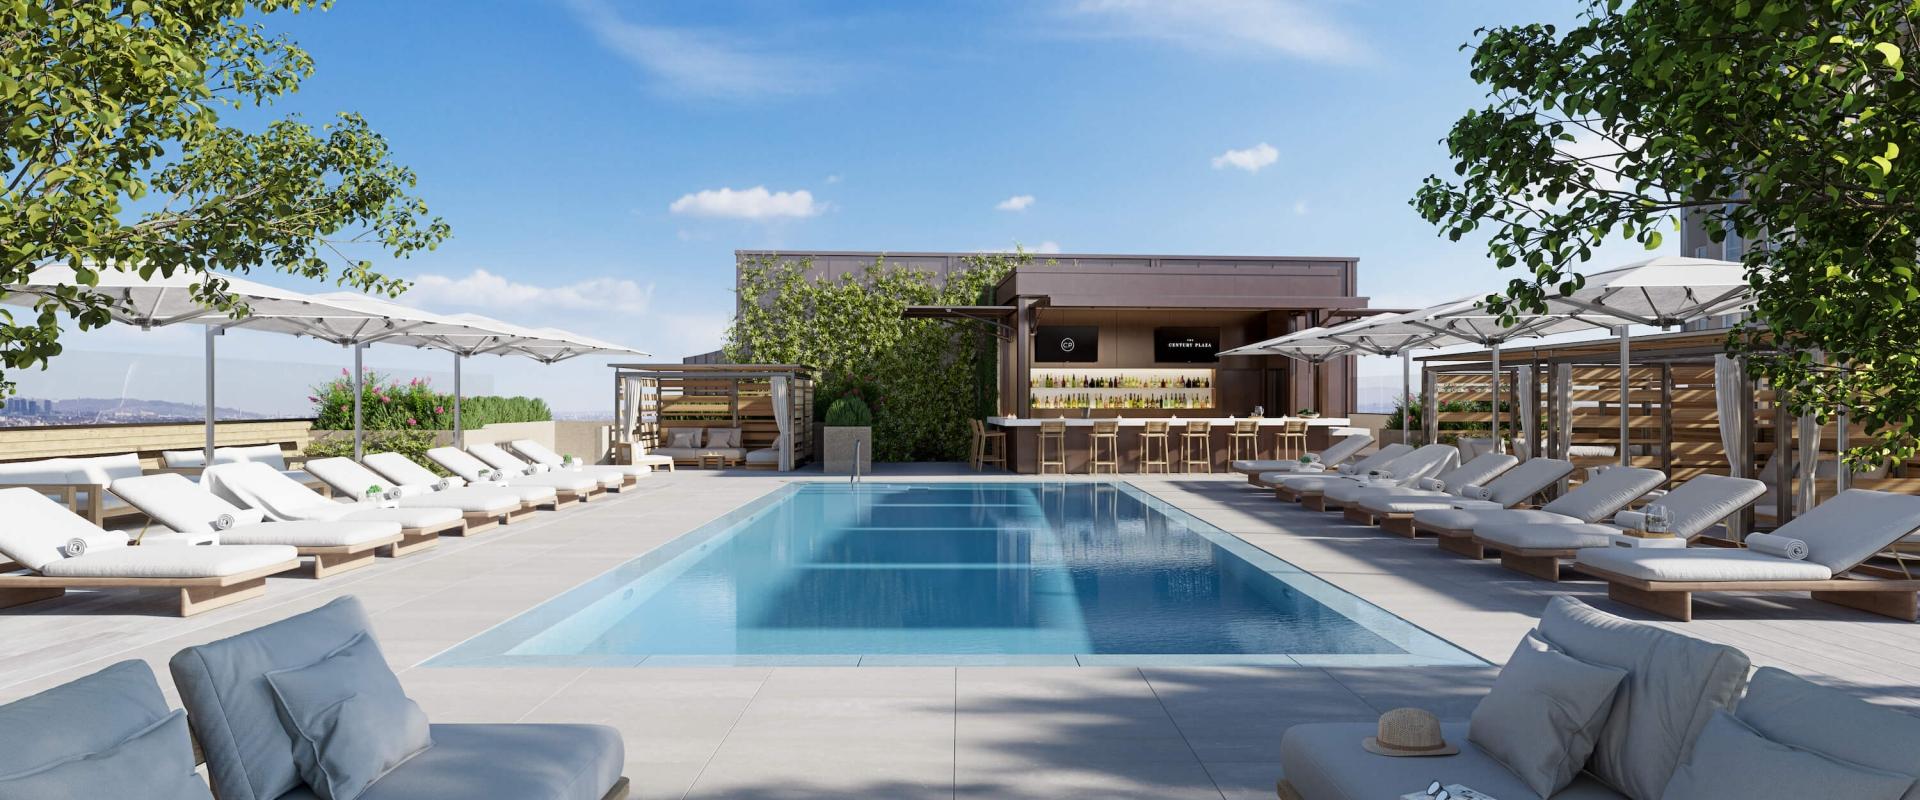 The rooftop pool at Fairmont Century Plaza, Century City, LA.